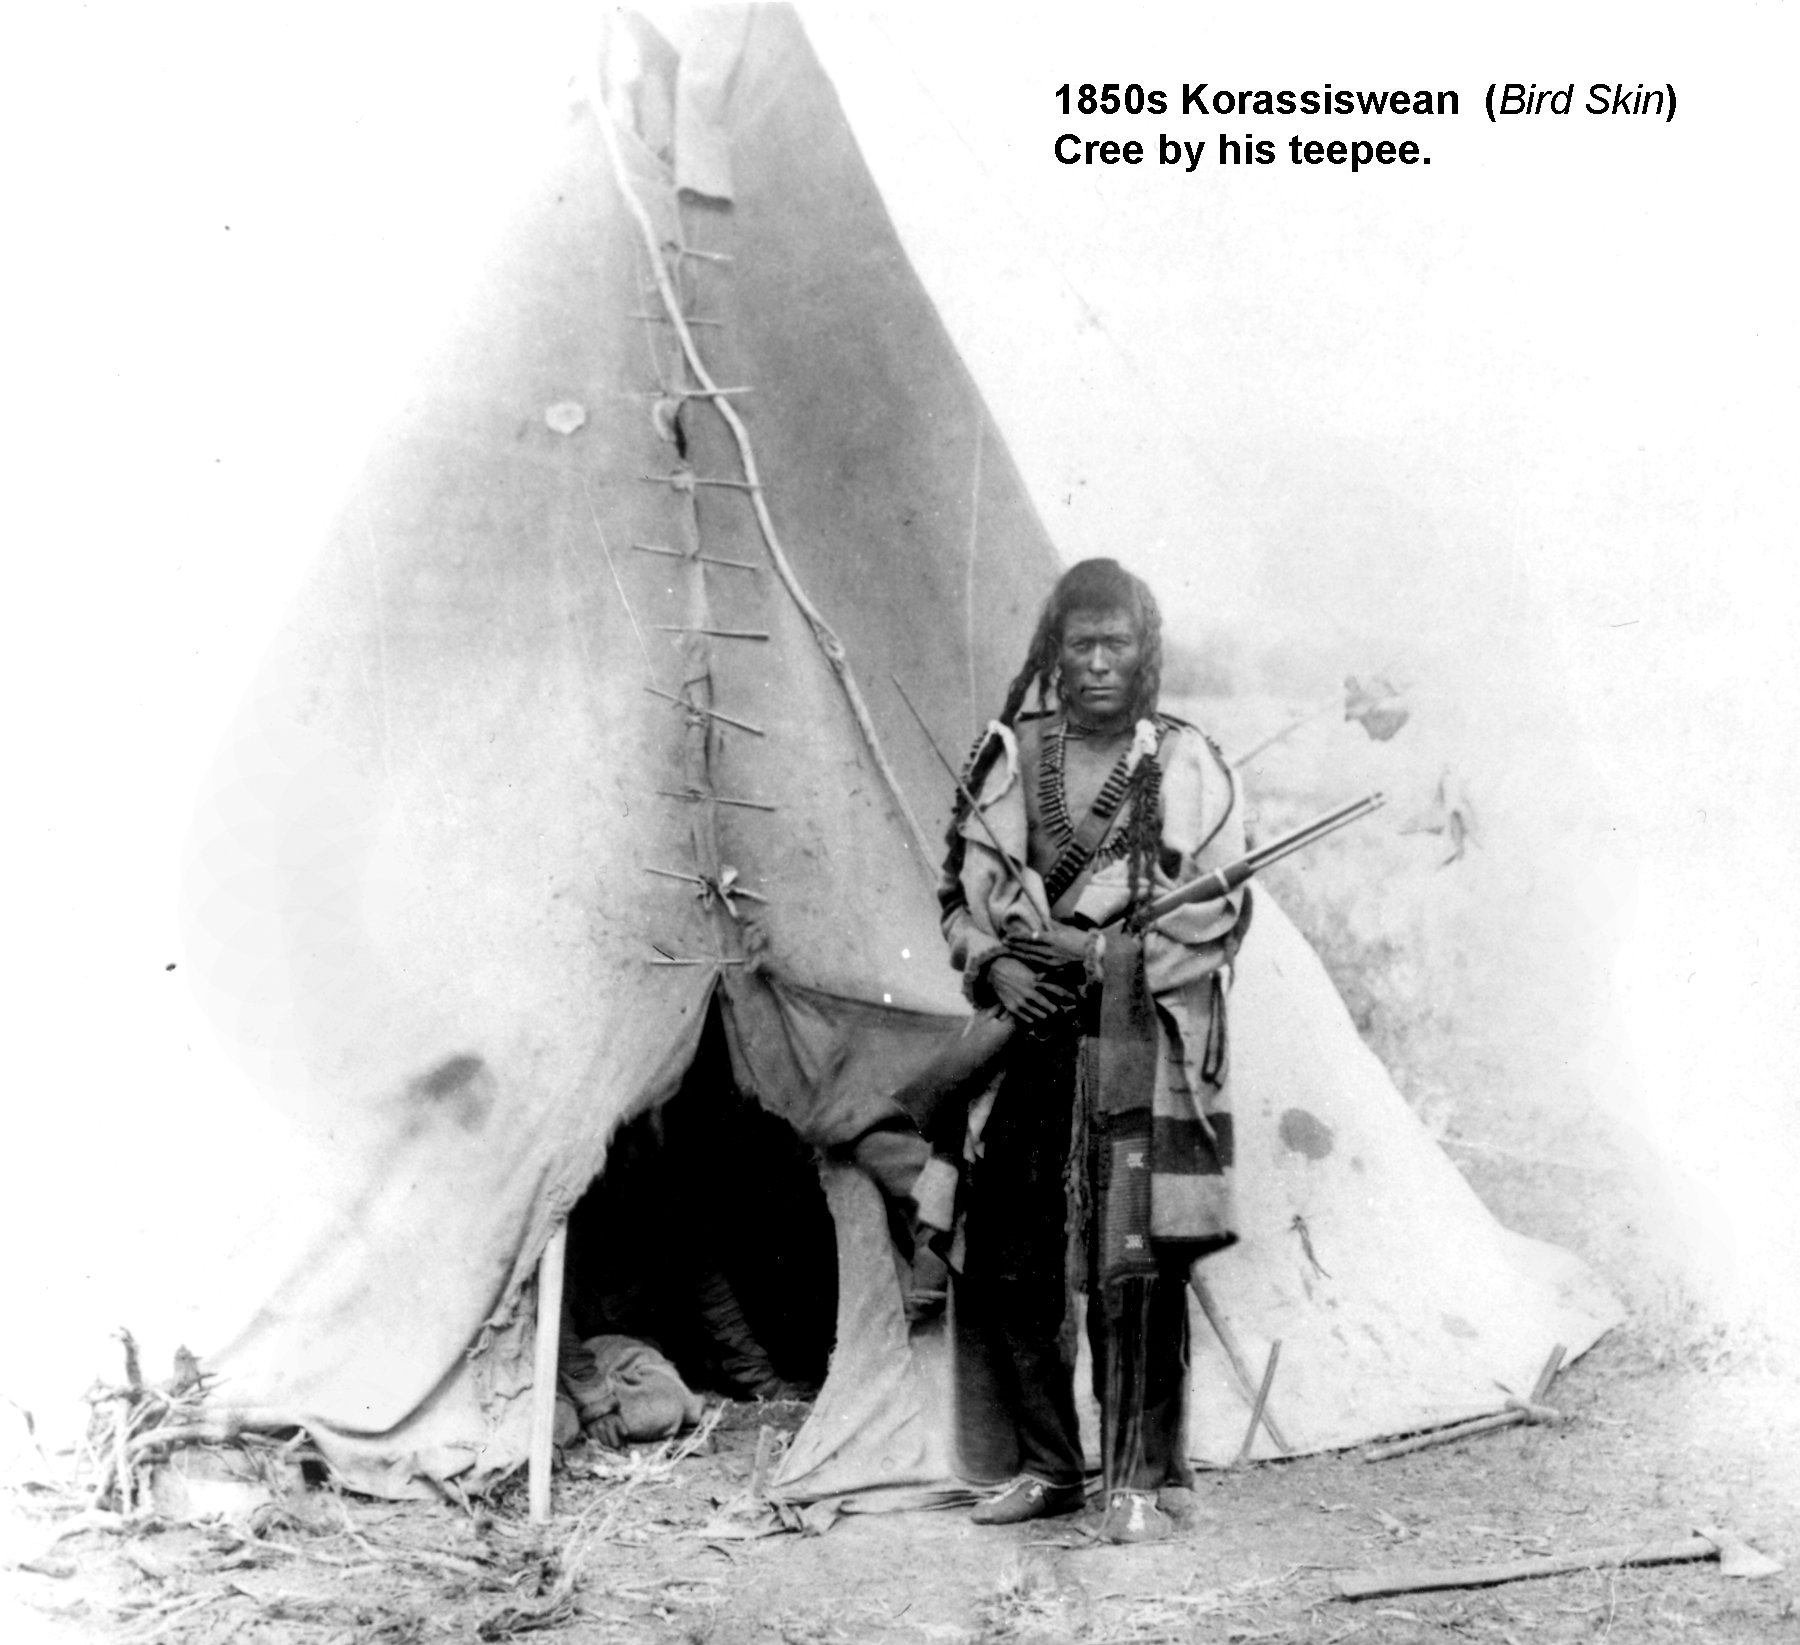 1850s Koriassiswean Bird Skin Plain Cree